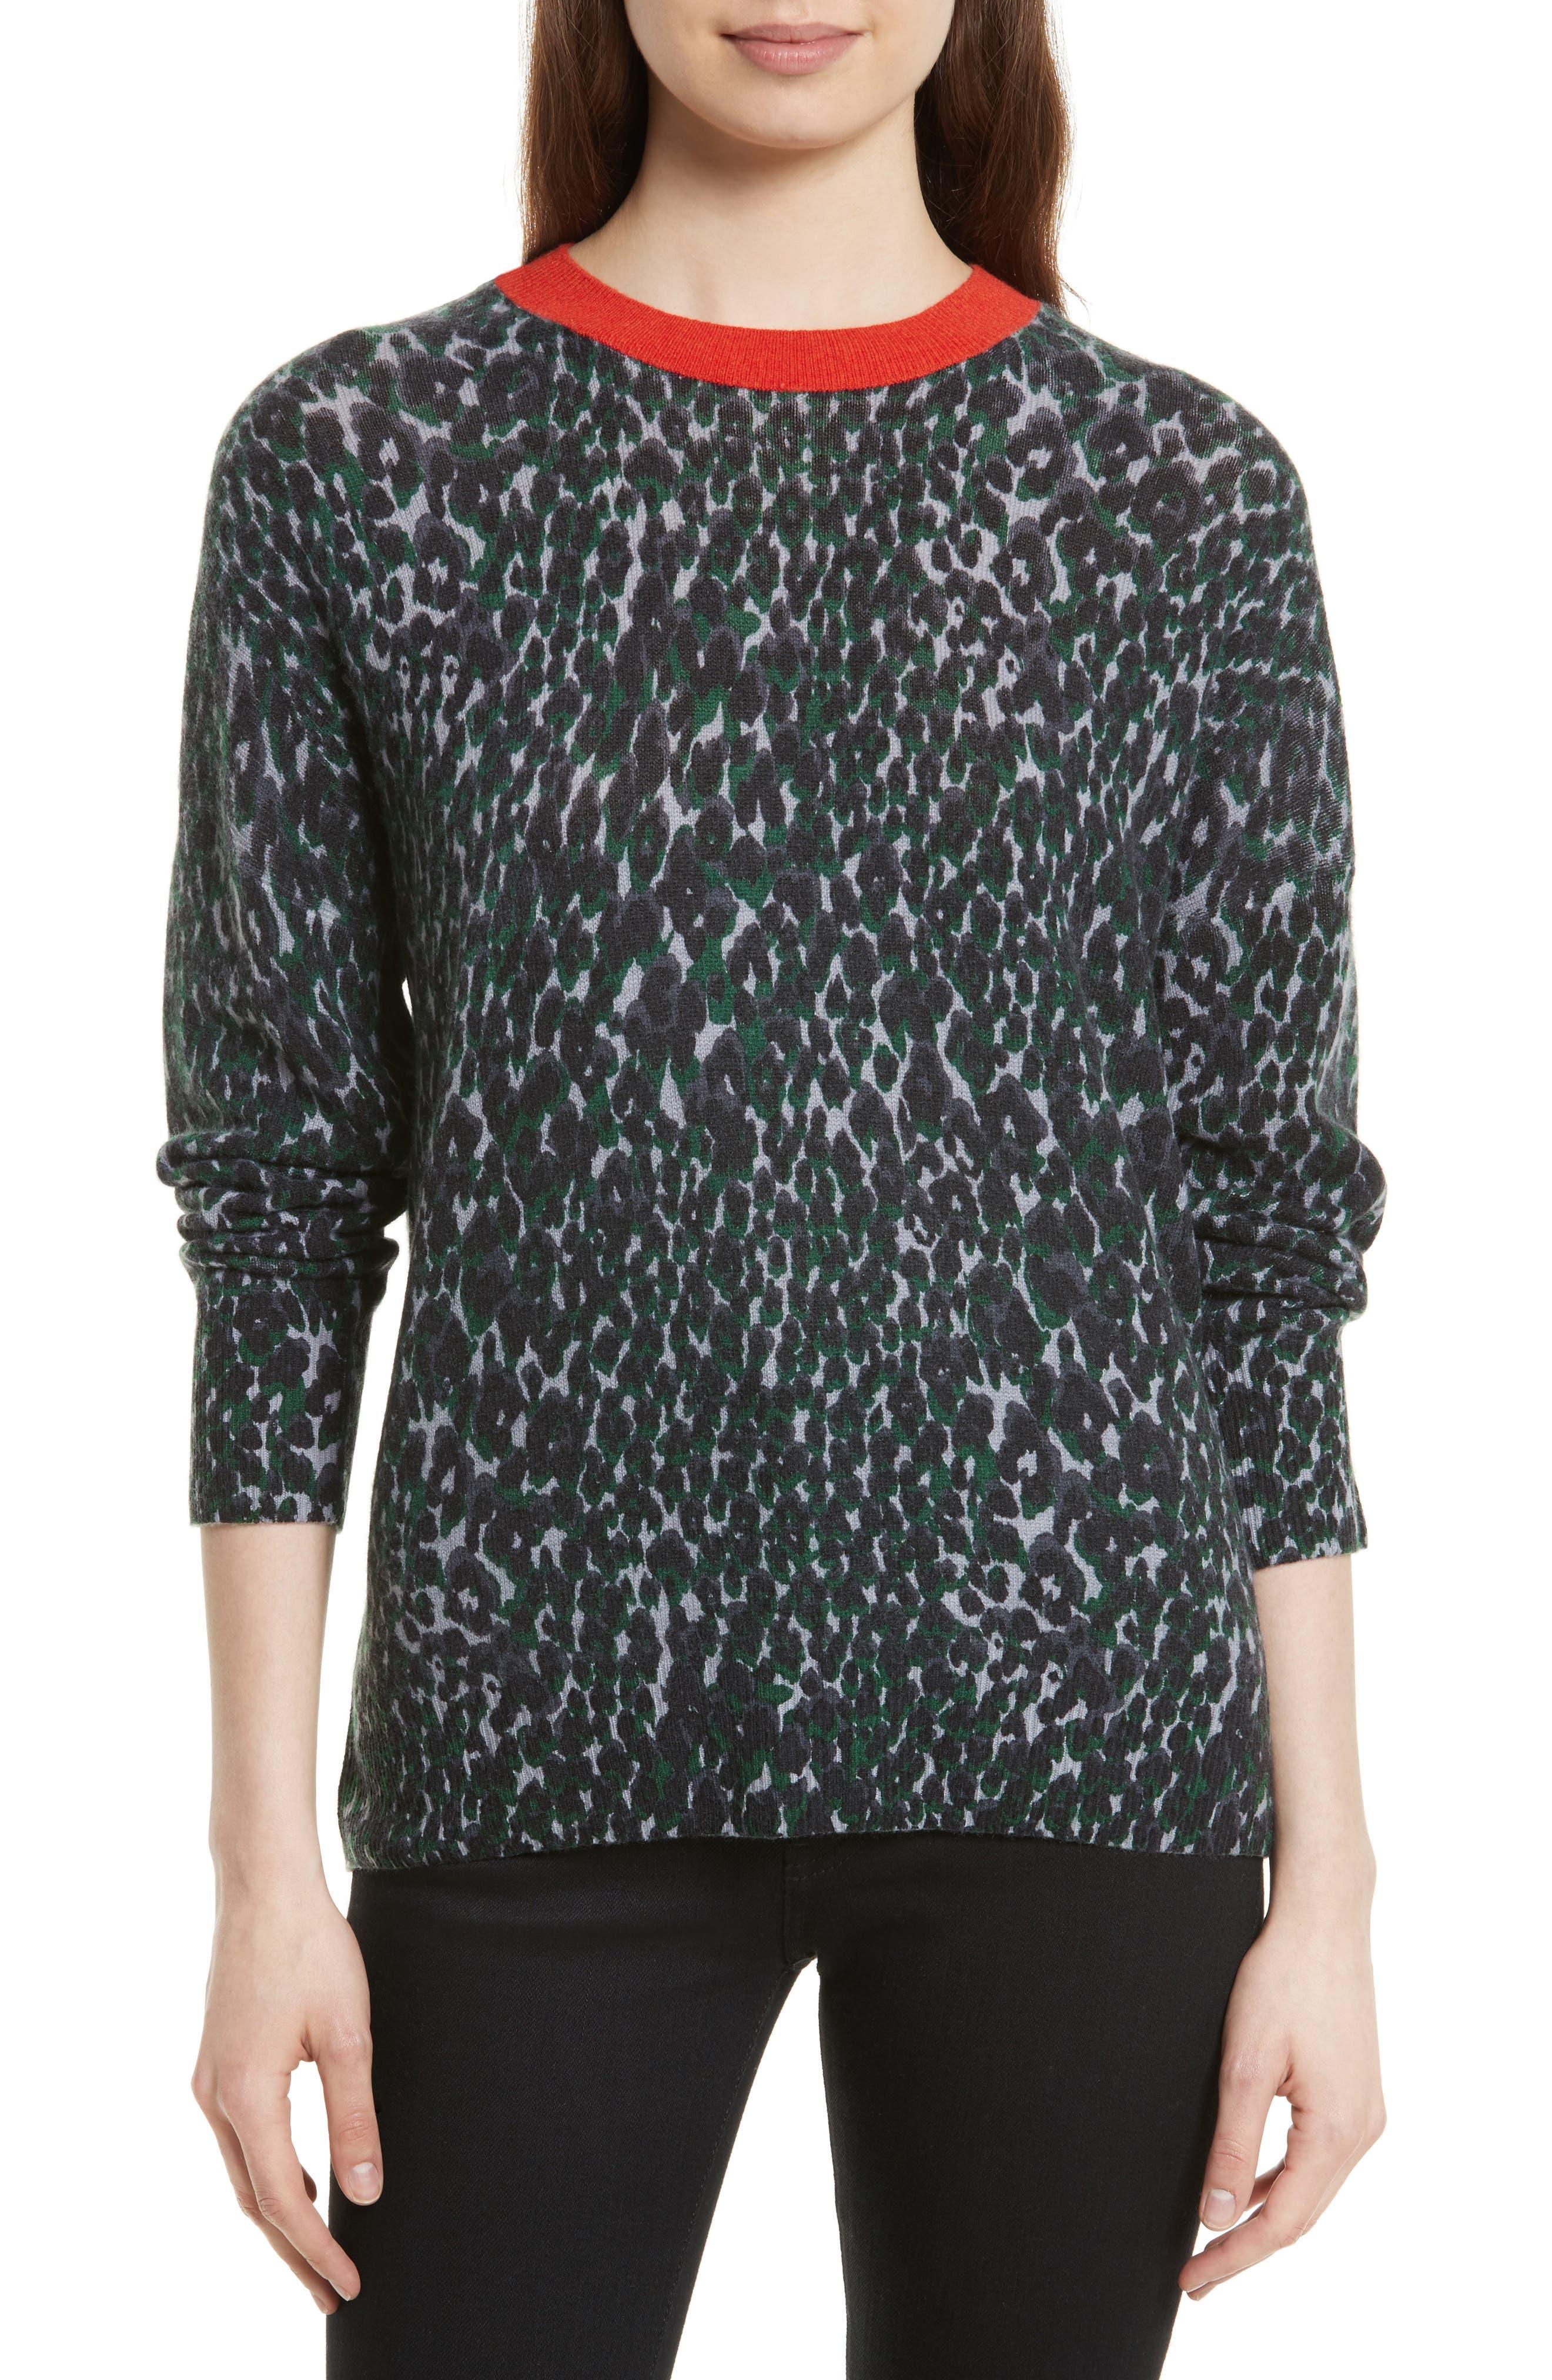 Equipment Melanie Leopard Print Cashmere Sweater